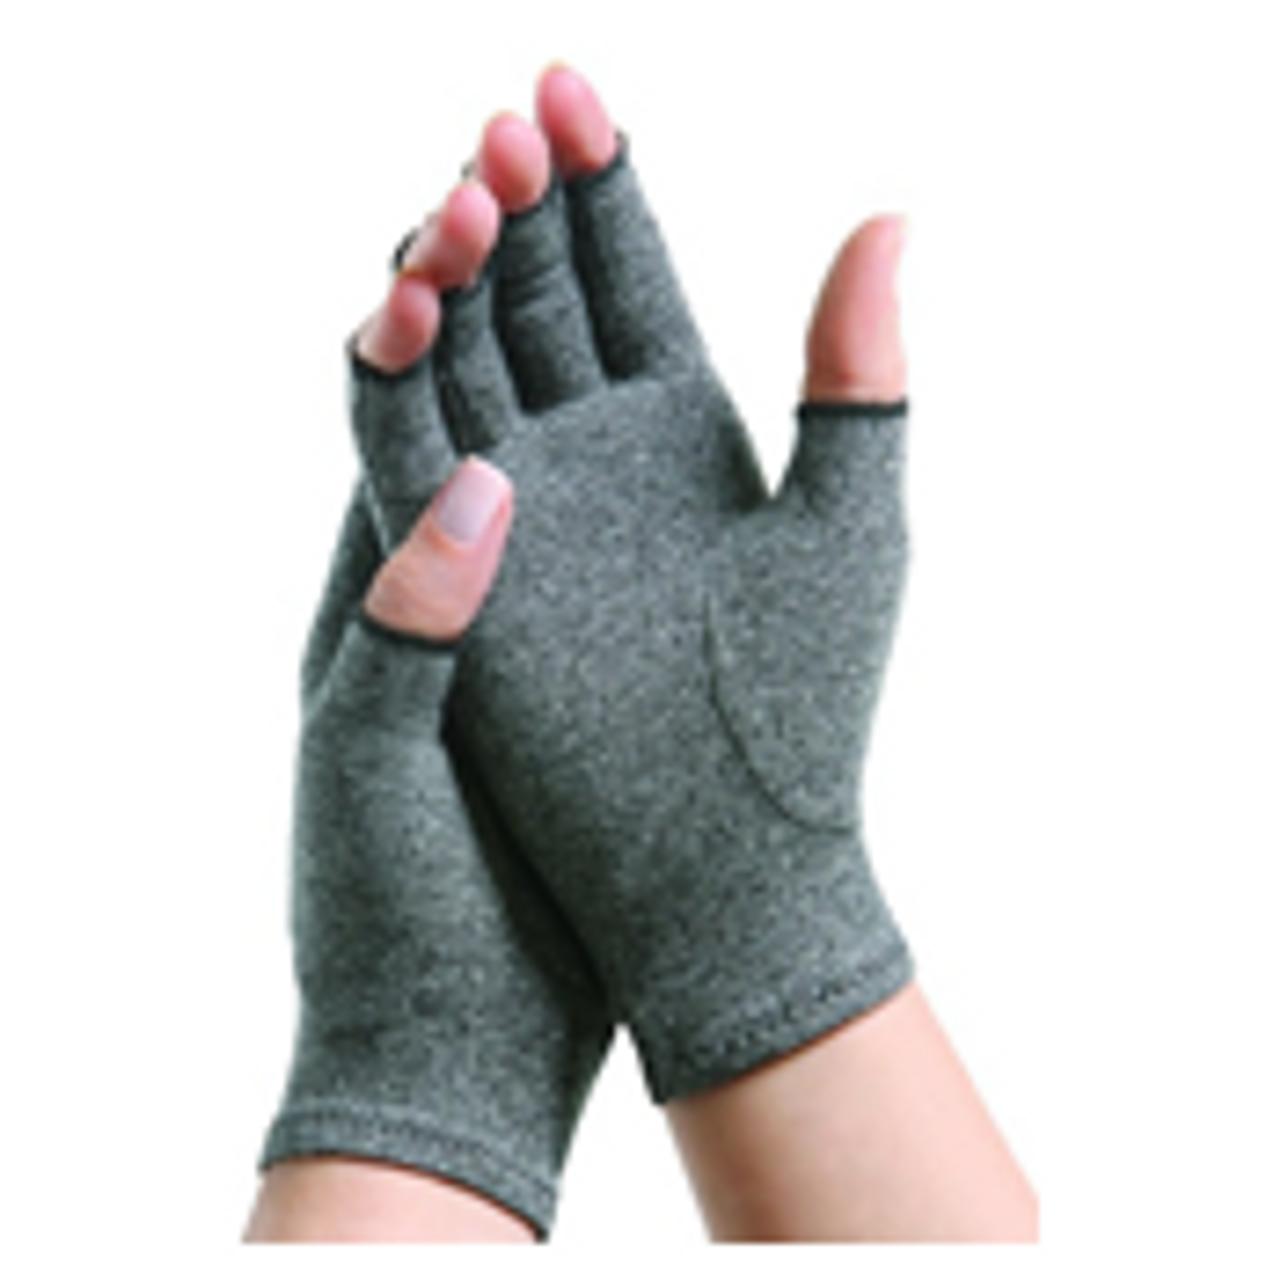 Arthritis Therapy & Care